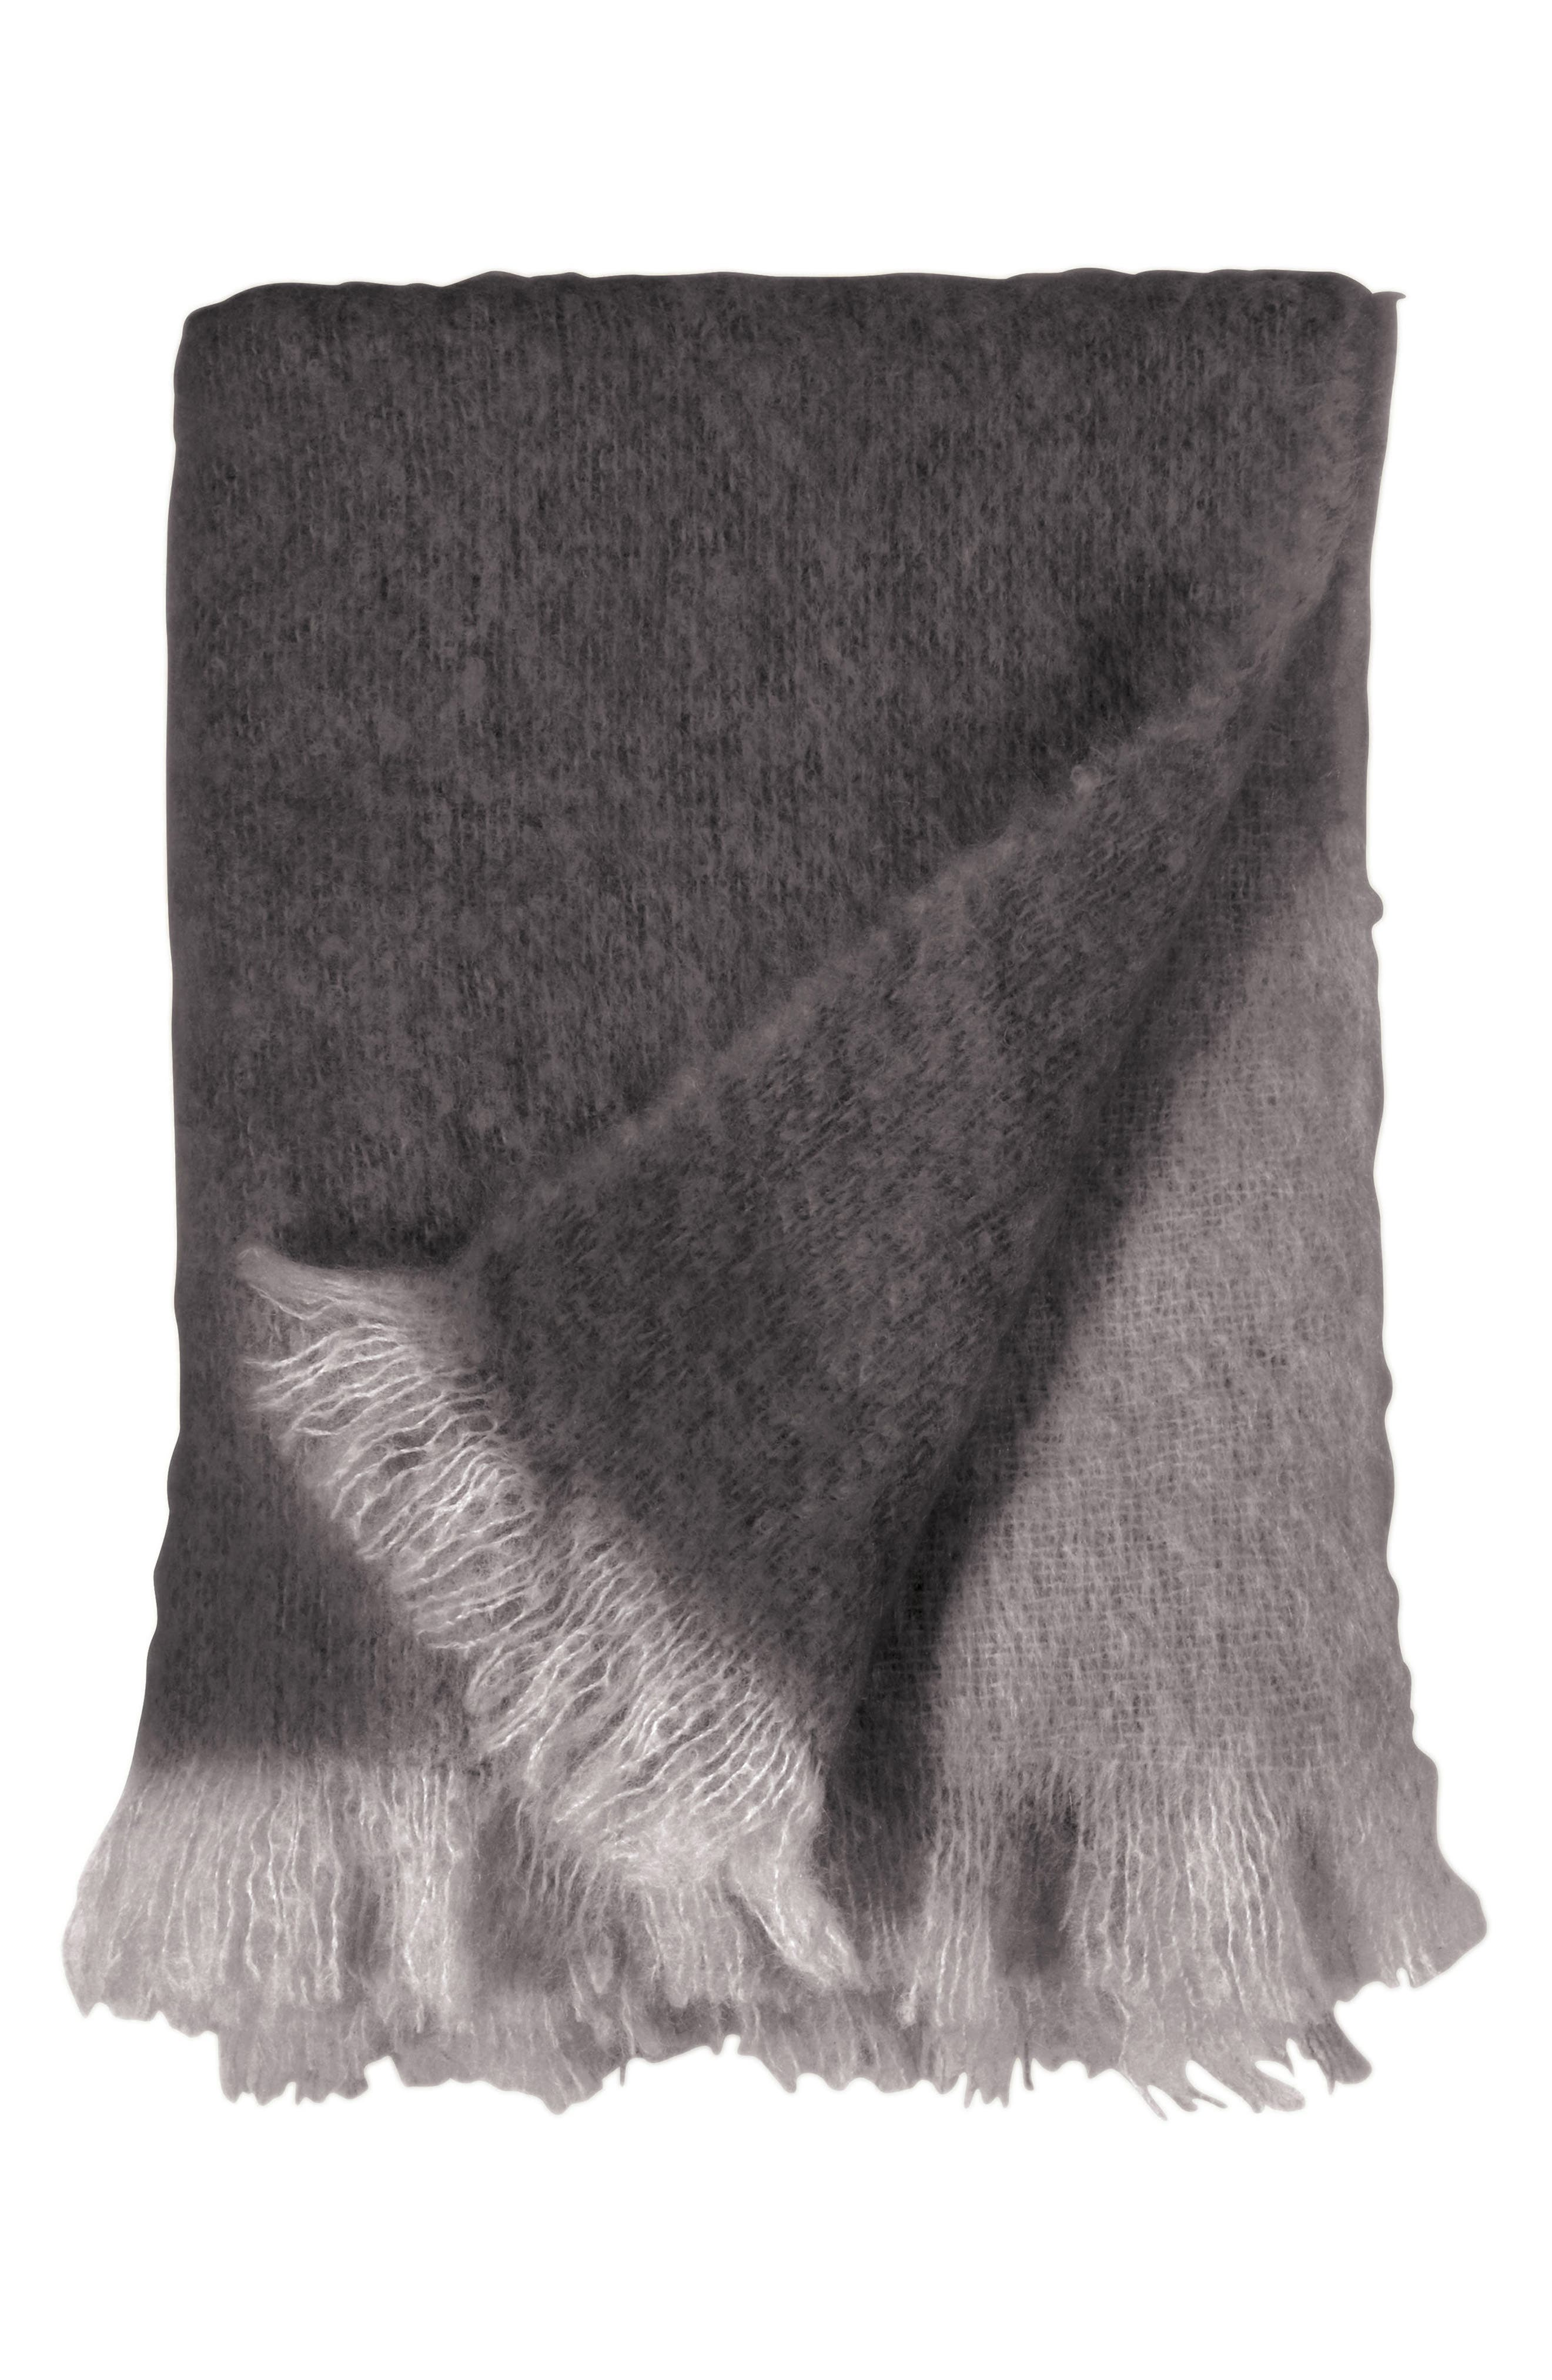 MICHAEL ARAM Mohair & Wool Throw, Main, color, CHARCOAL